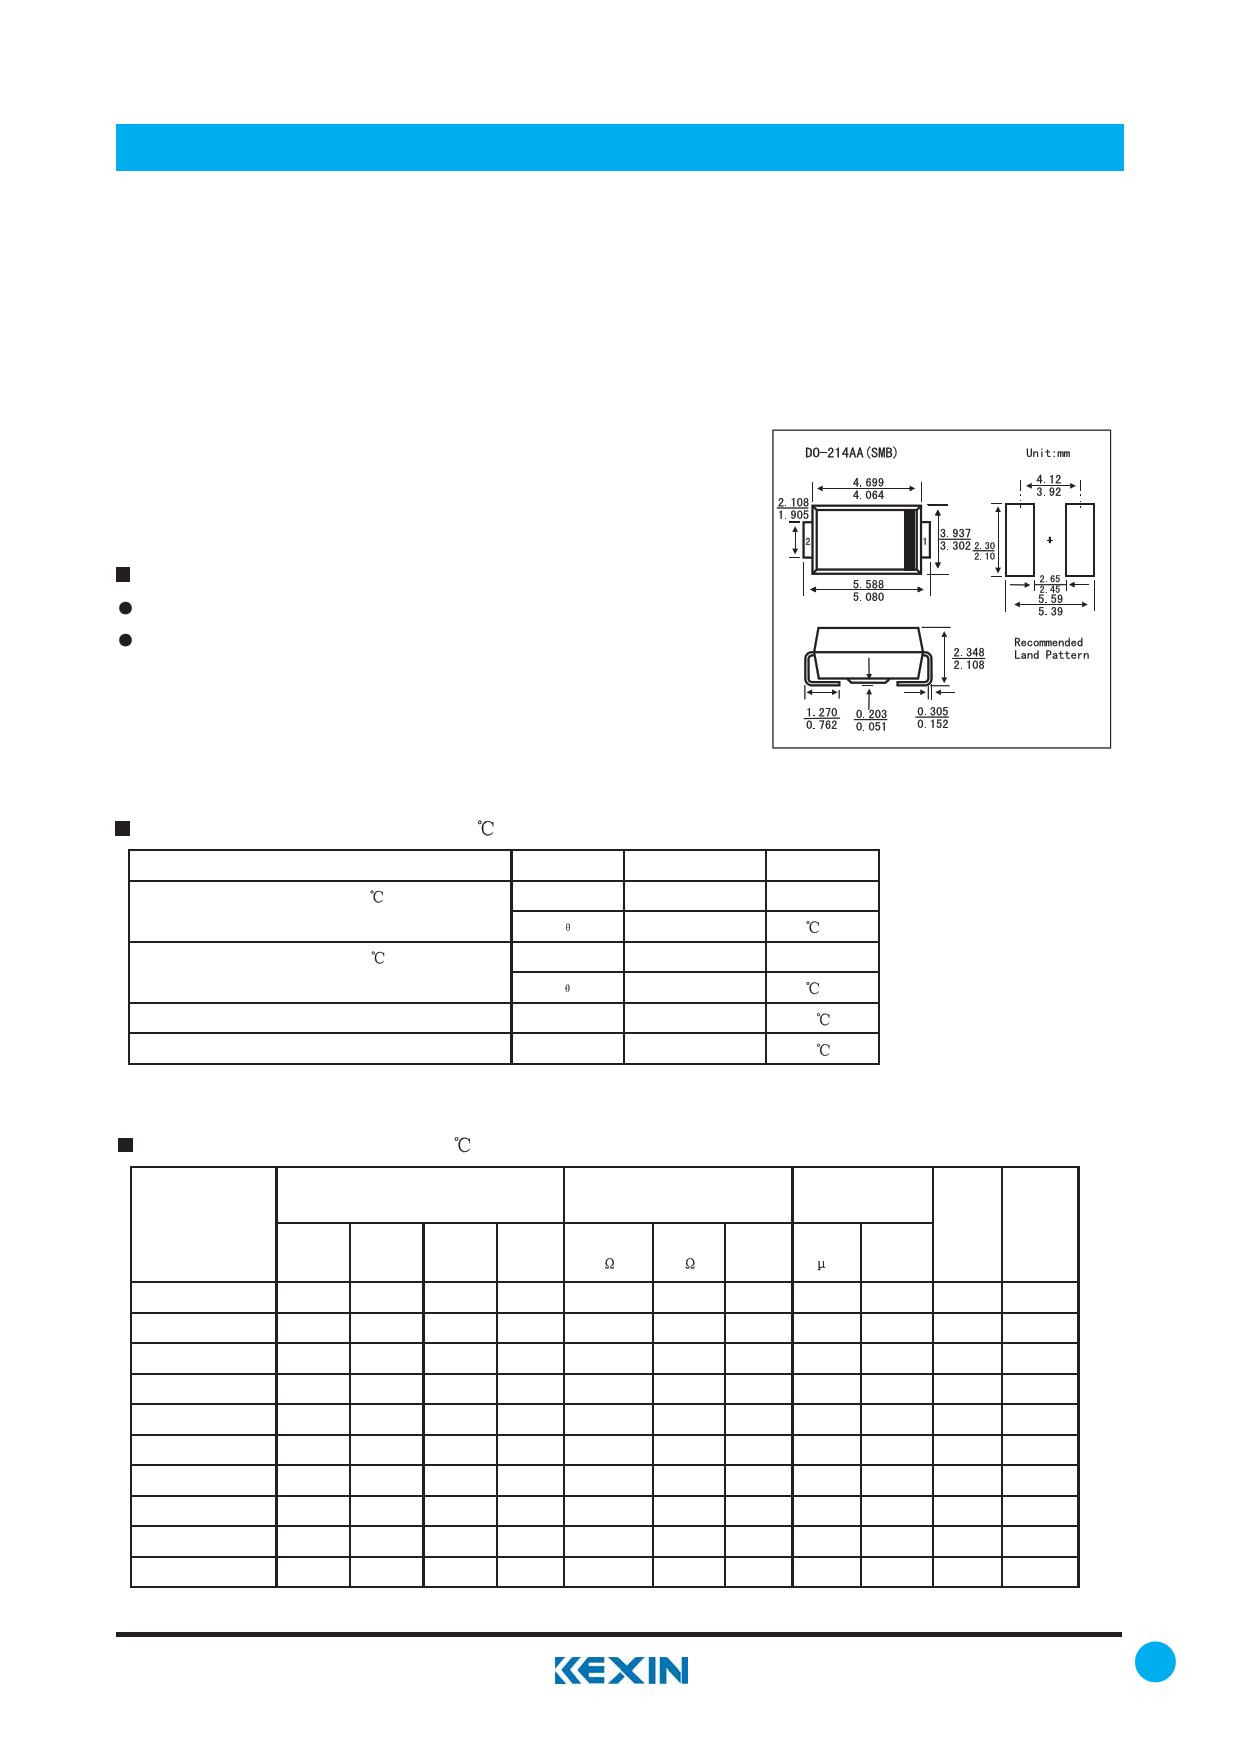 1SMB5915B datasheet